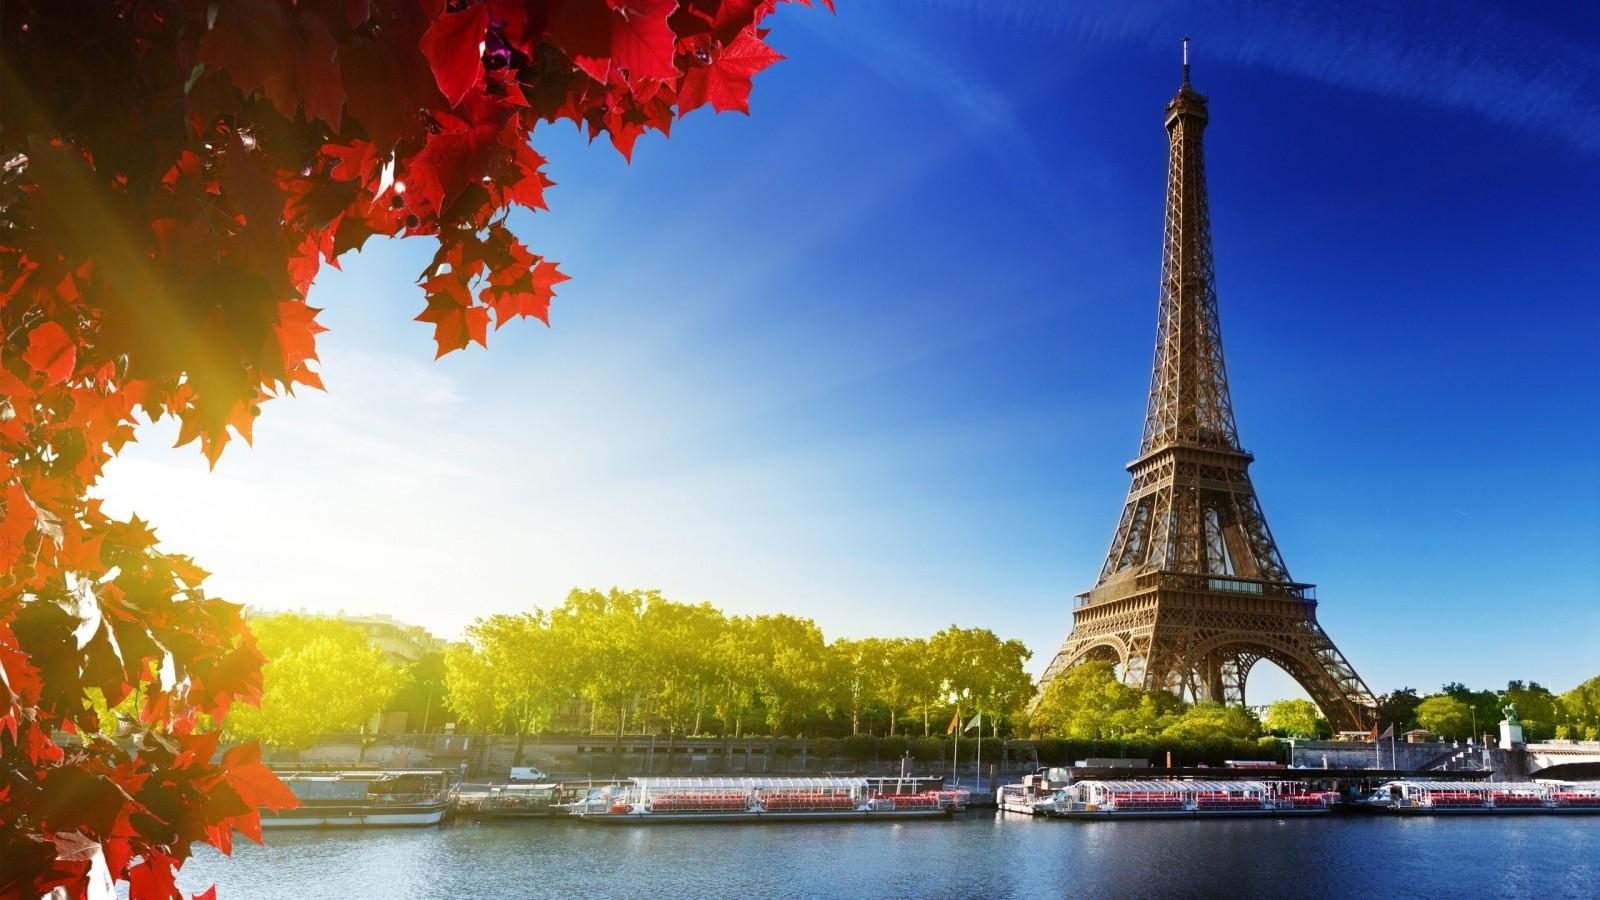 Torre-Eiffel-Autumn-900x1600